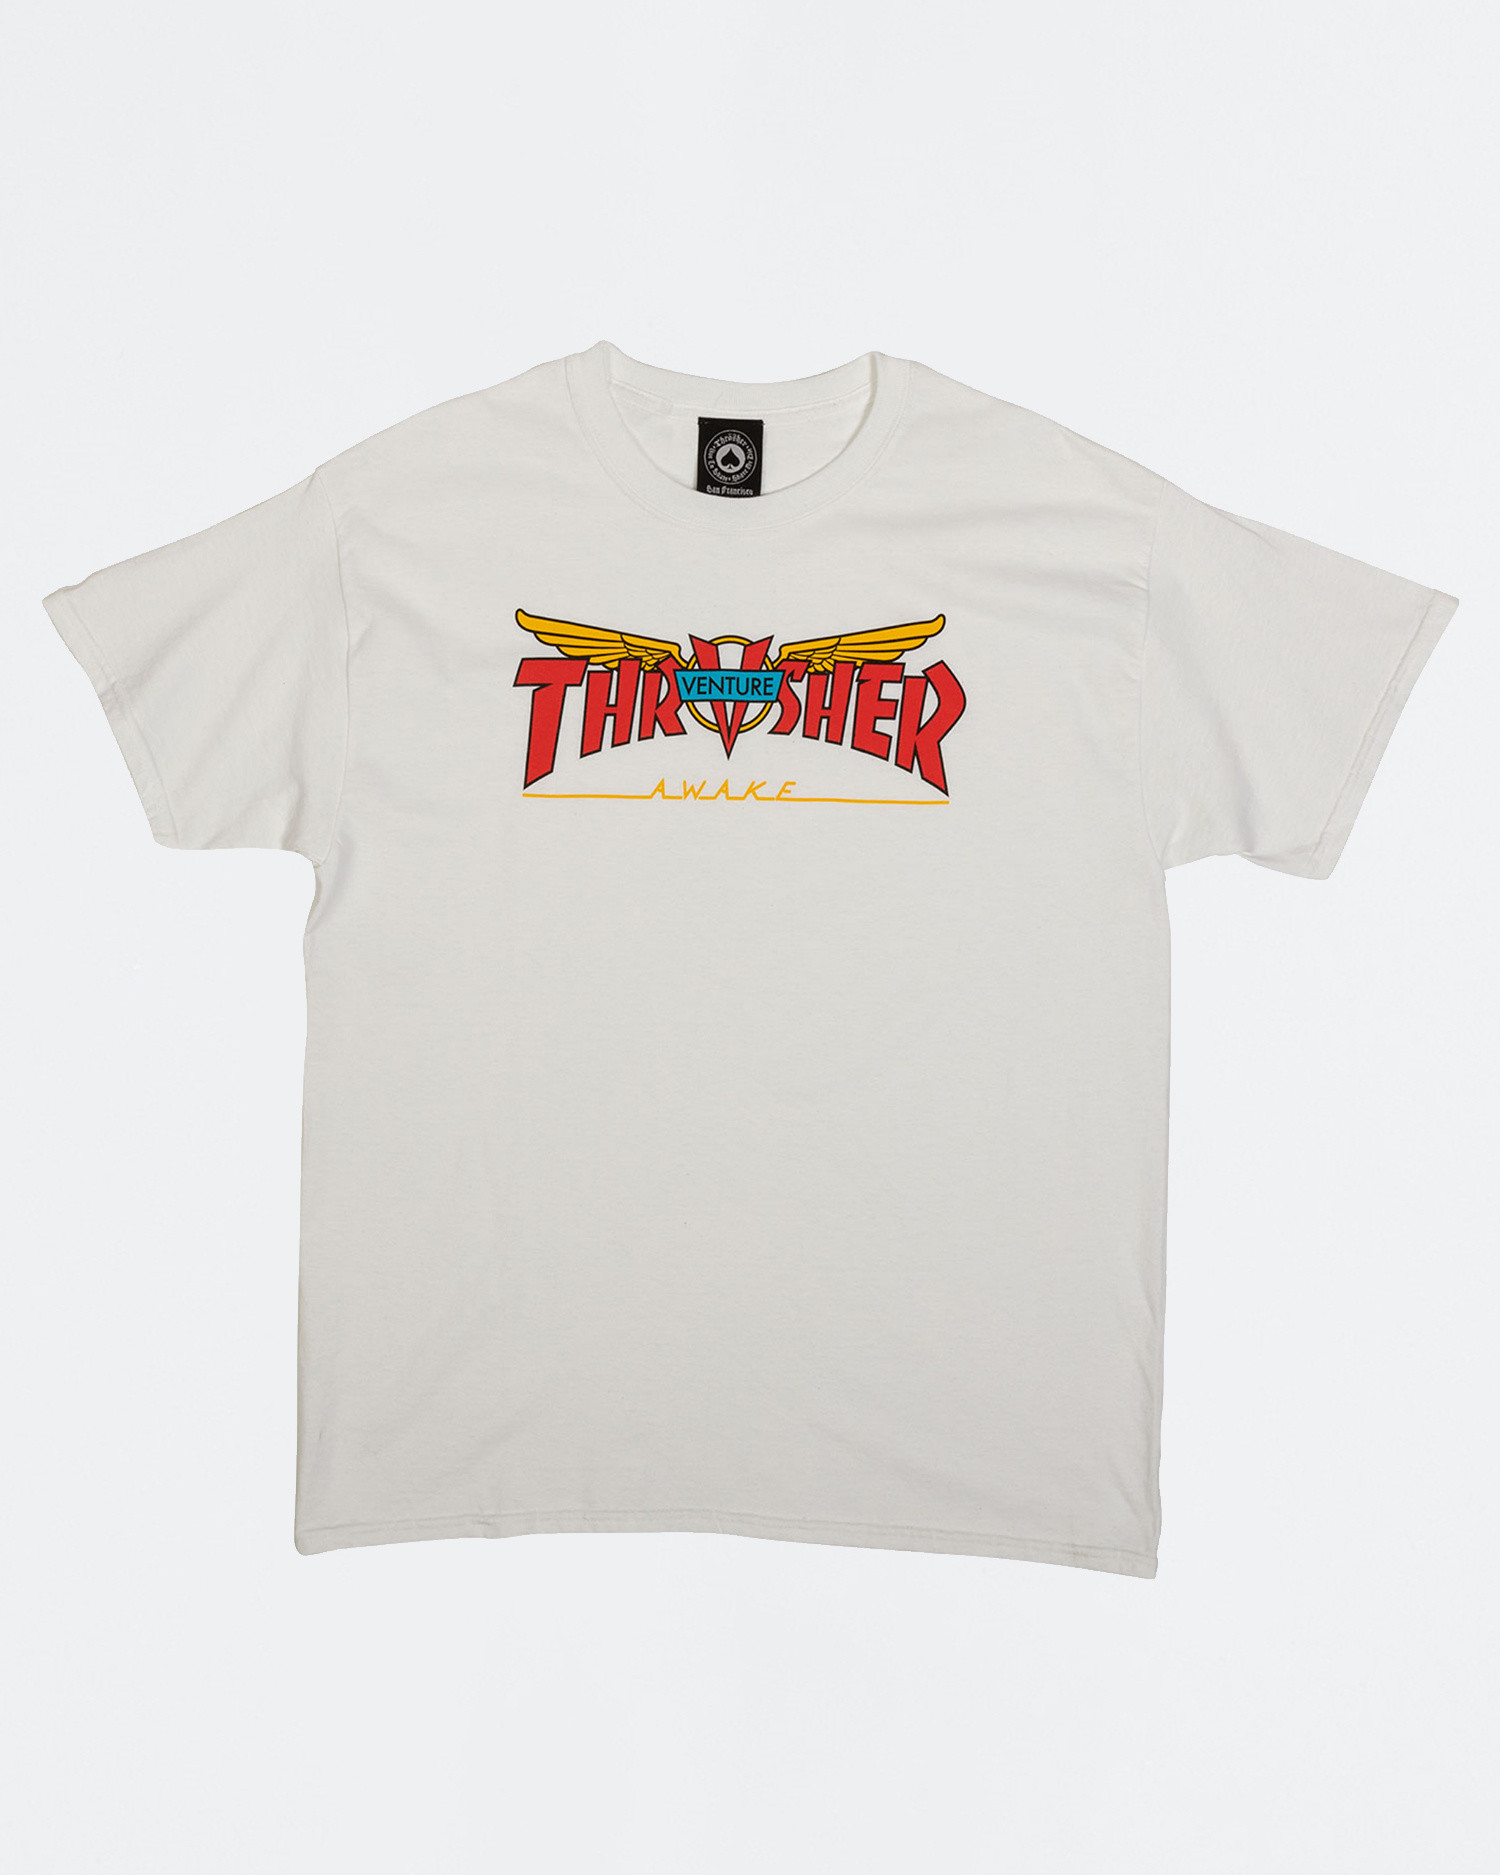 Thrasher X Venture Collab Shortsleeve White